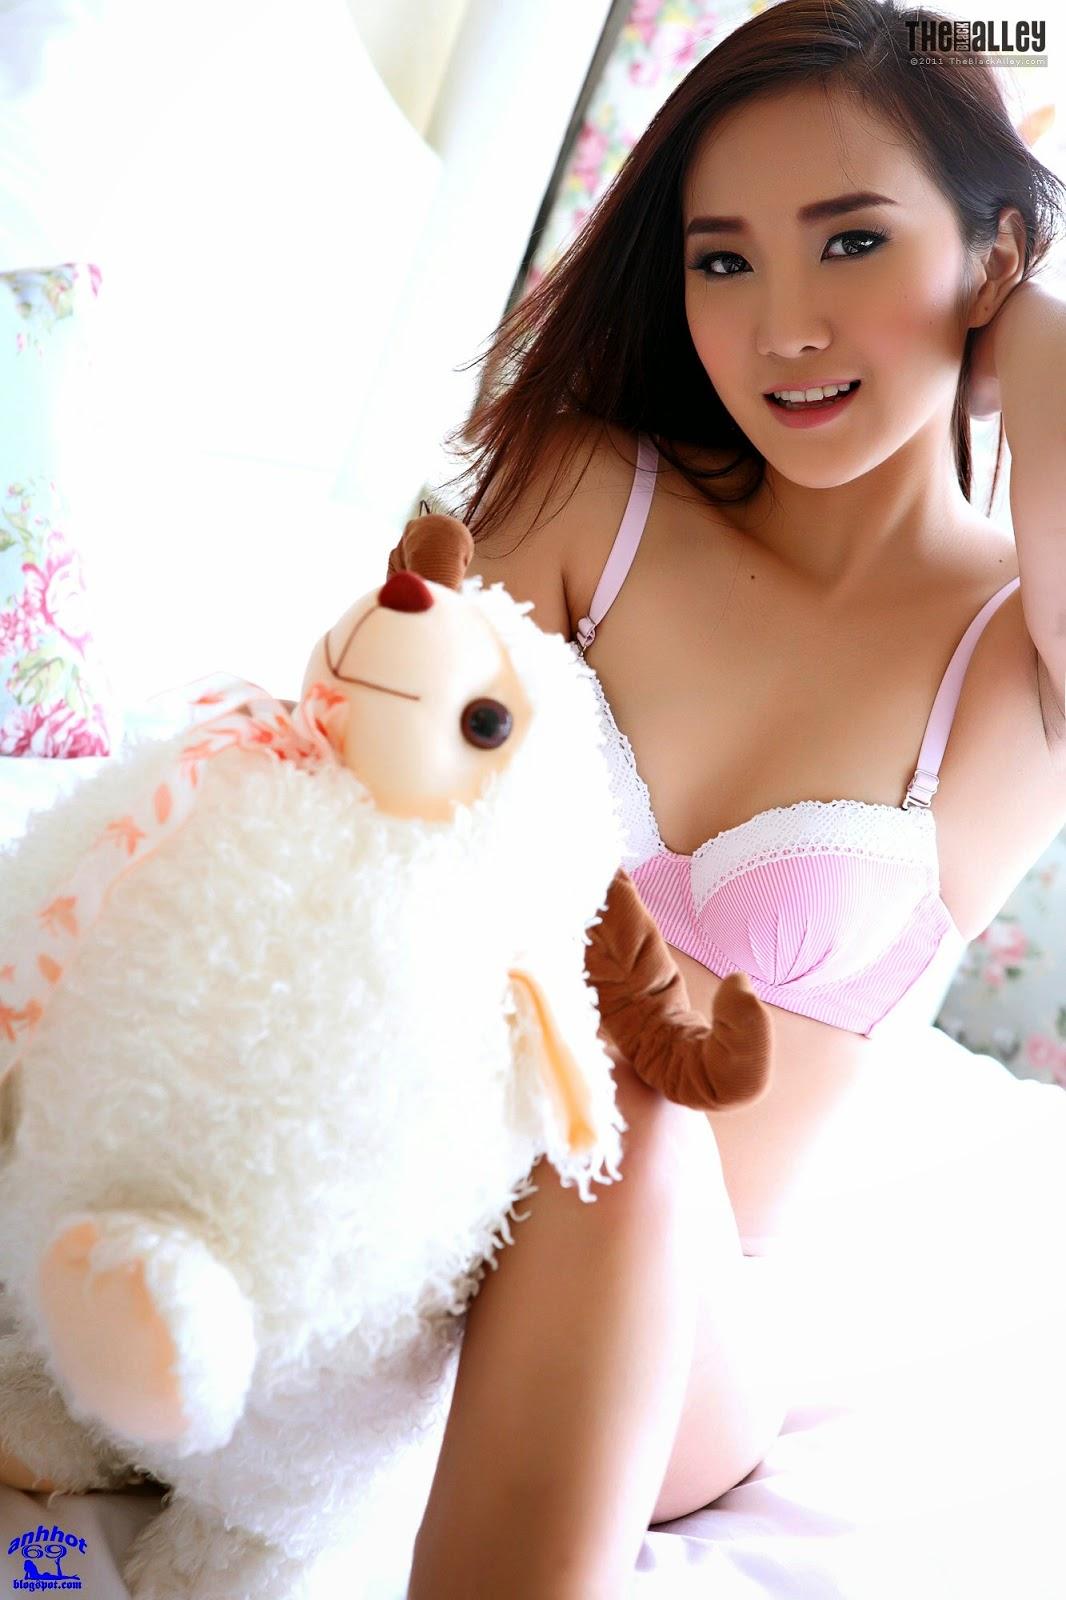 lolita-cheng-64-029